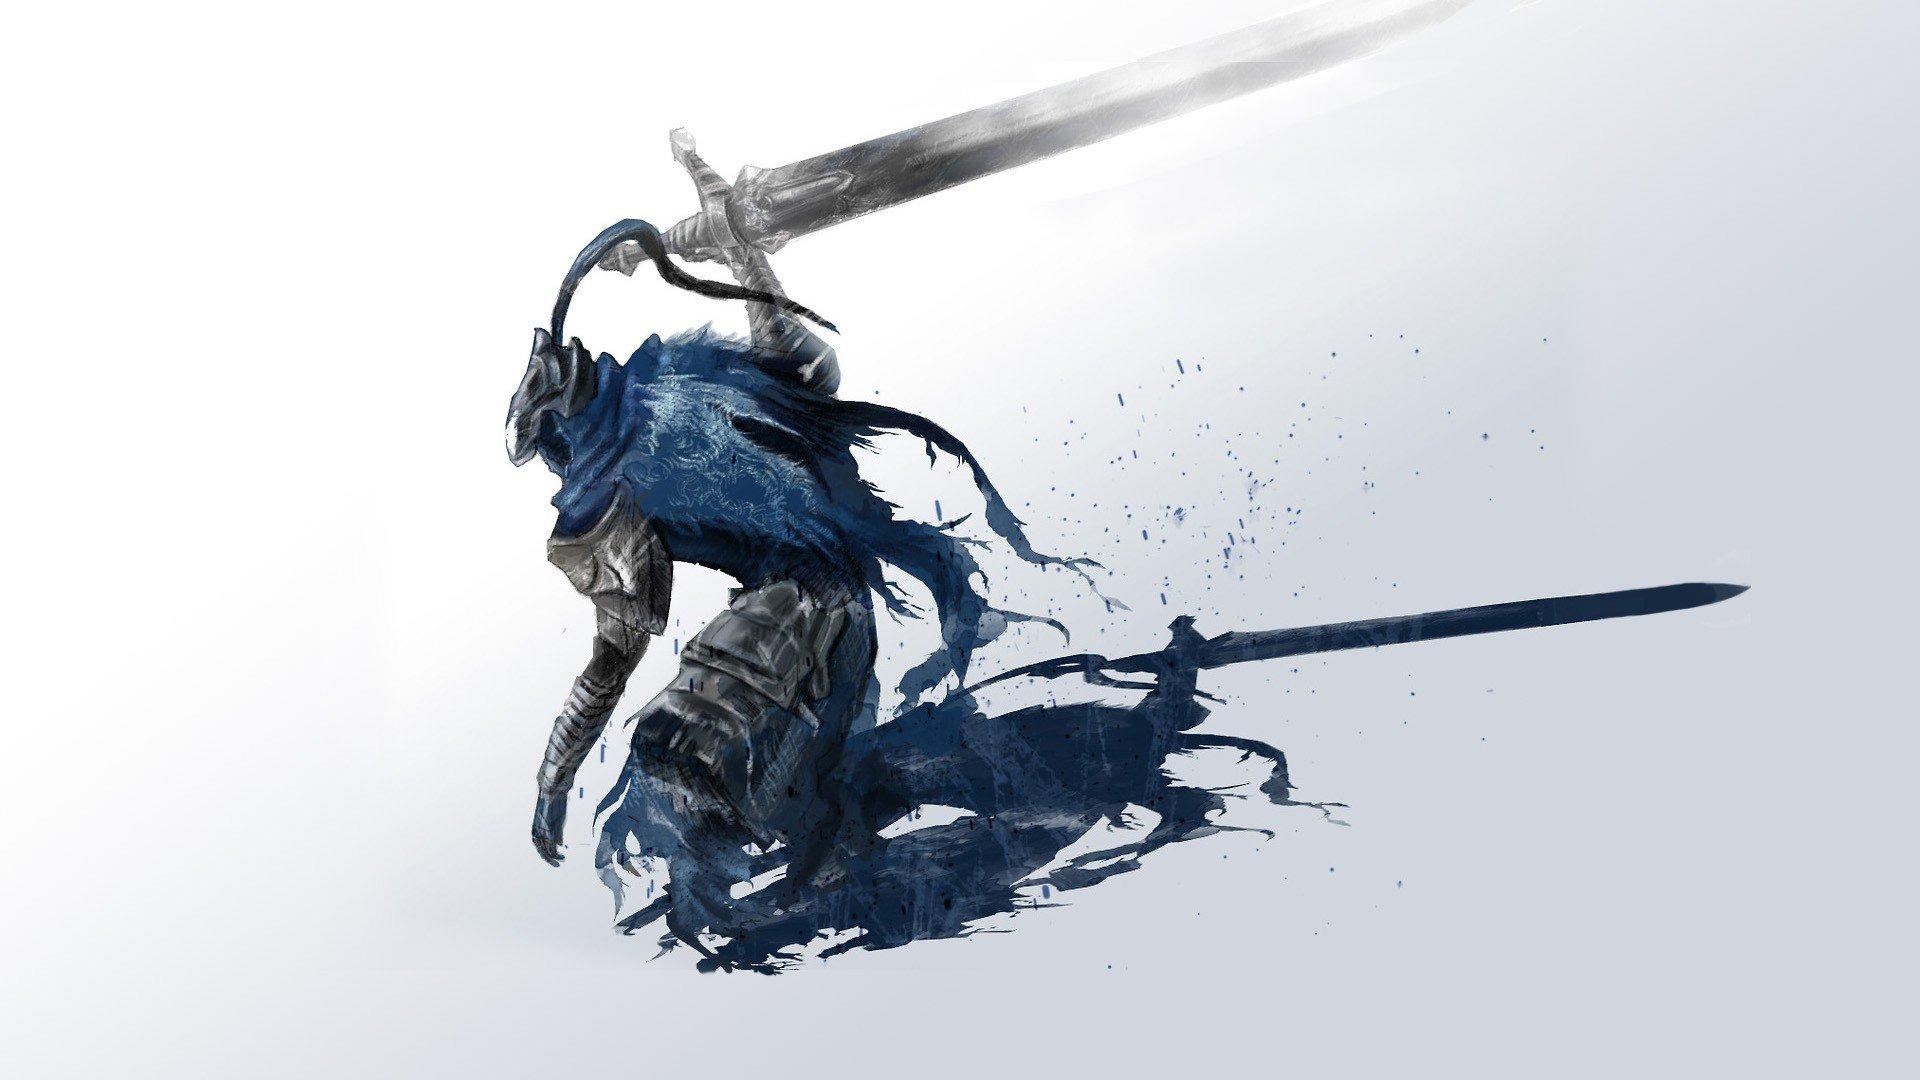 Artorias The Abysswalker Hd Wallpaper